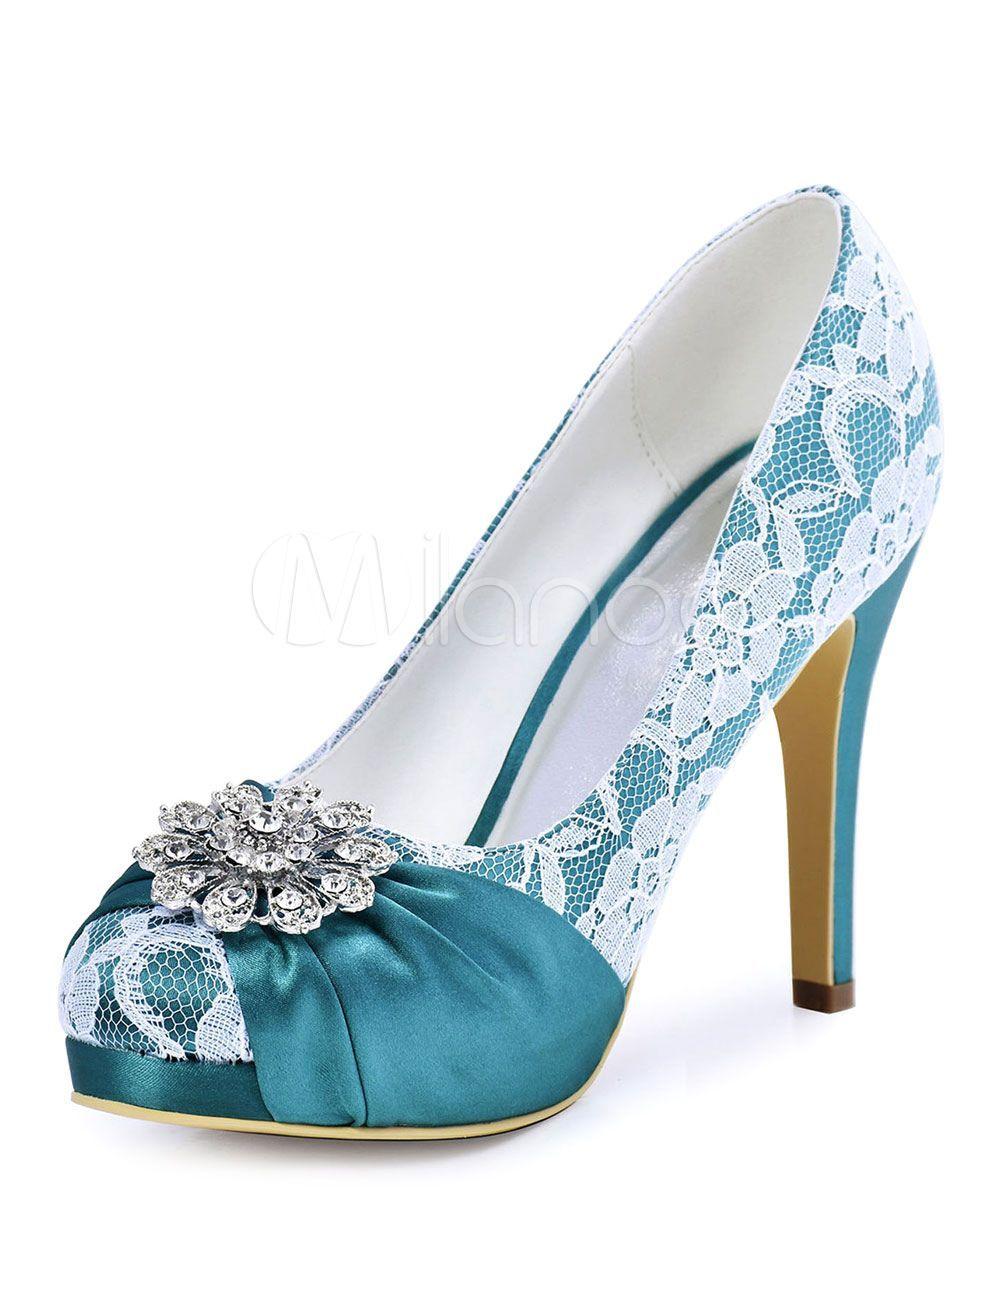 Women S Bridal Shoes Teal Round Toe Rhinestones Slip On High Heel Wedding Shoes Teal Wedding Shoes Rhinestone High Heels Pumps Heels Stilettos